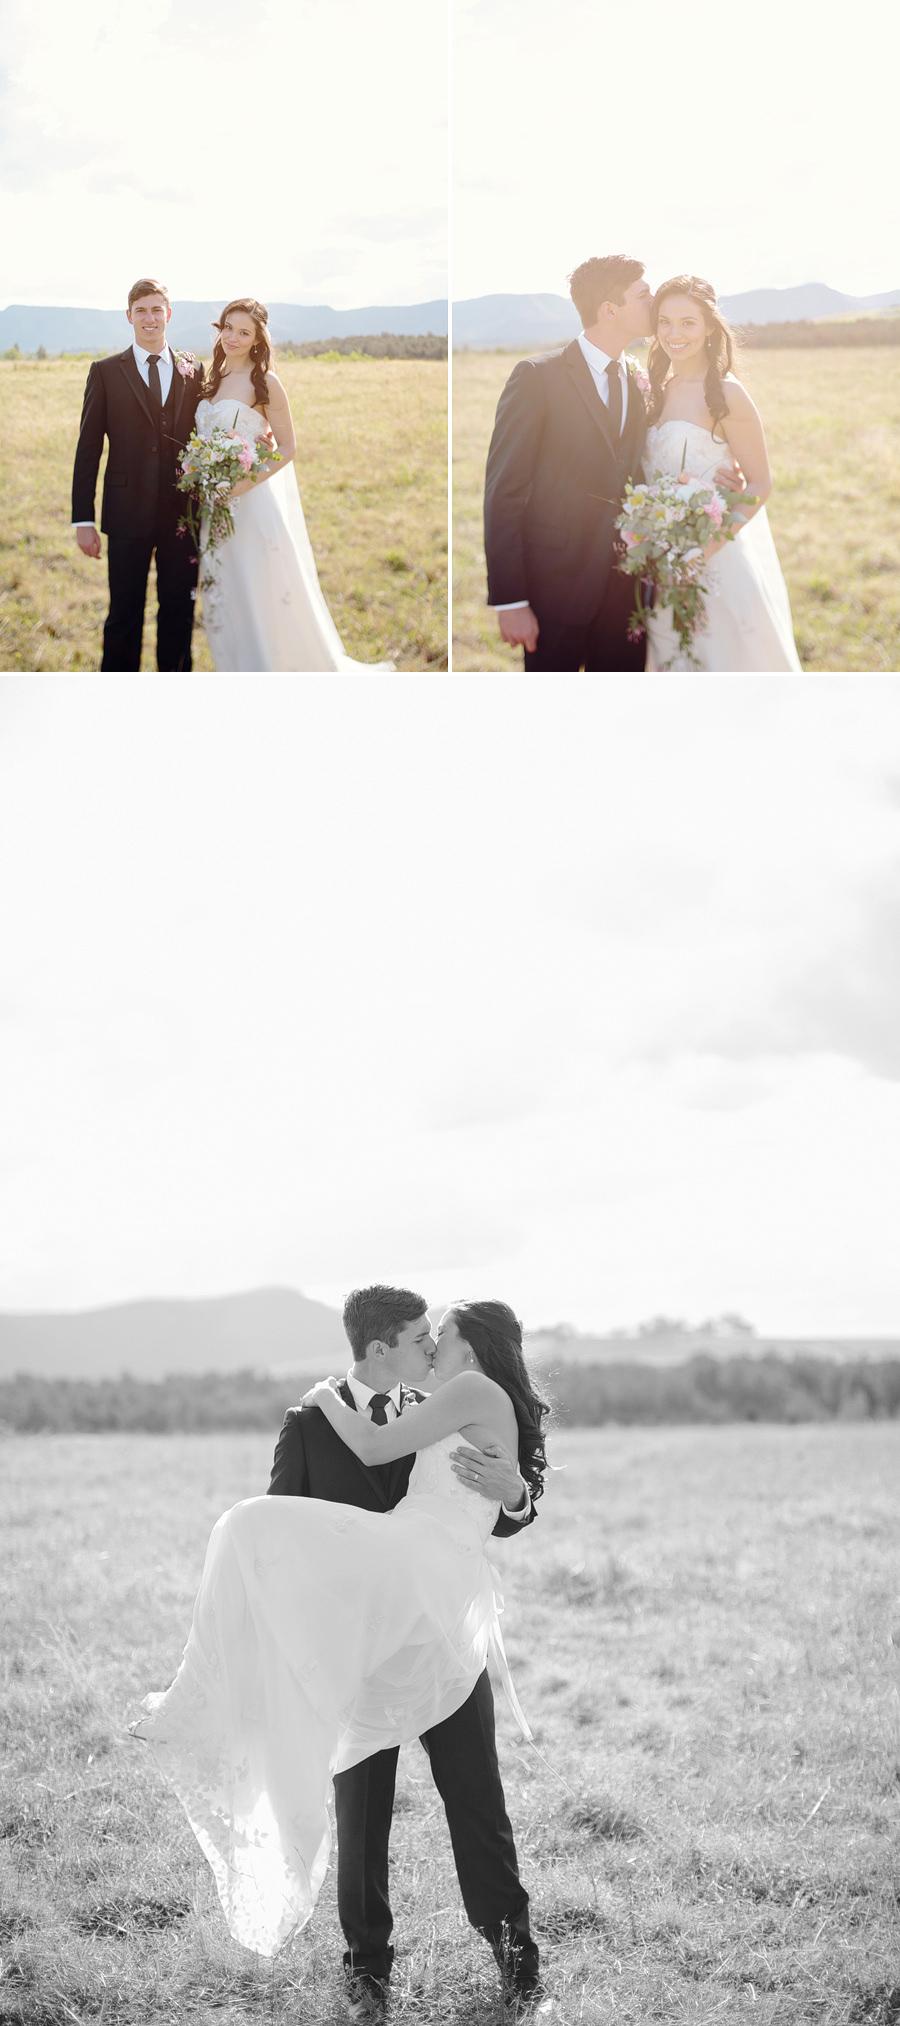 Elegant Wedding Photography: Bride & Groom Portraits